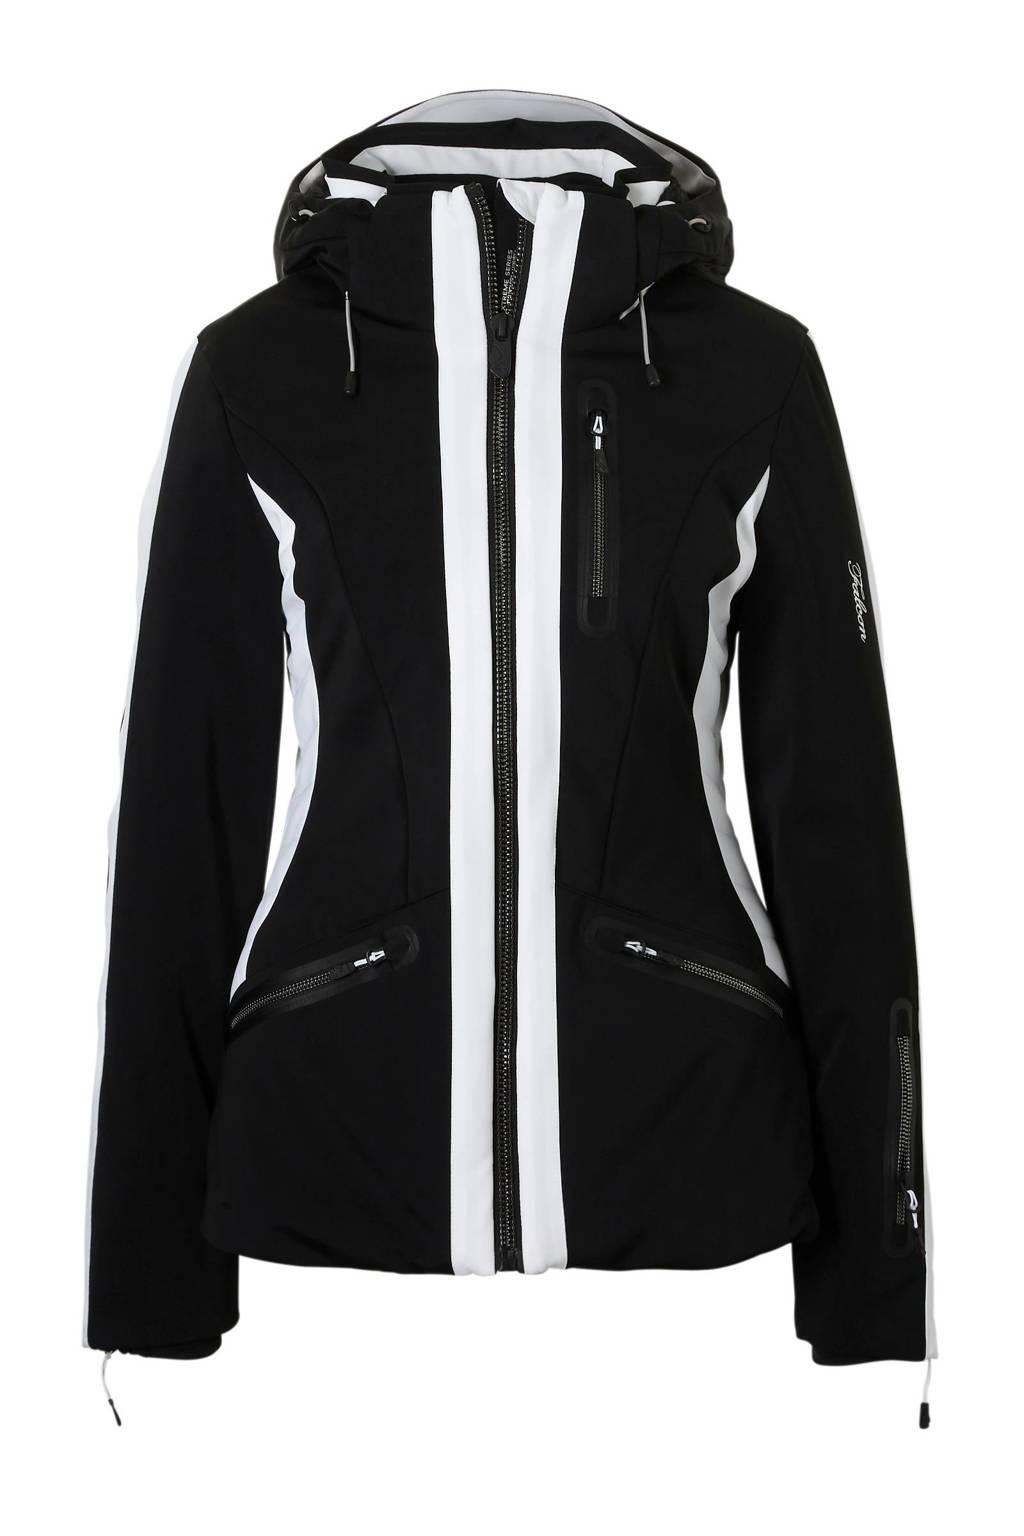 Falcon ski-jack Tebulo zwart, Zwart/wit